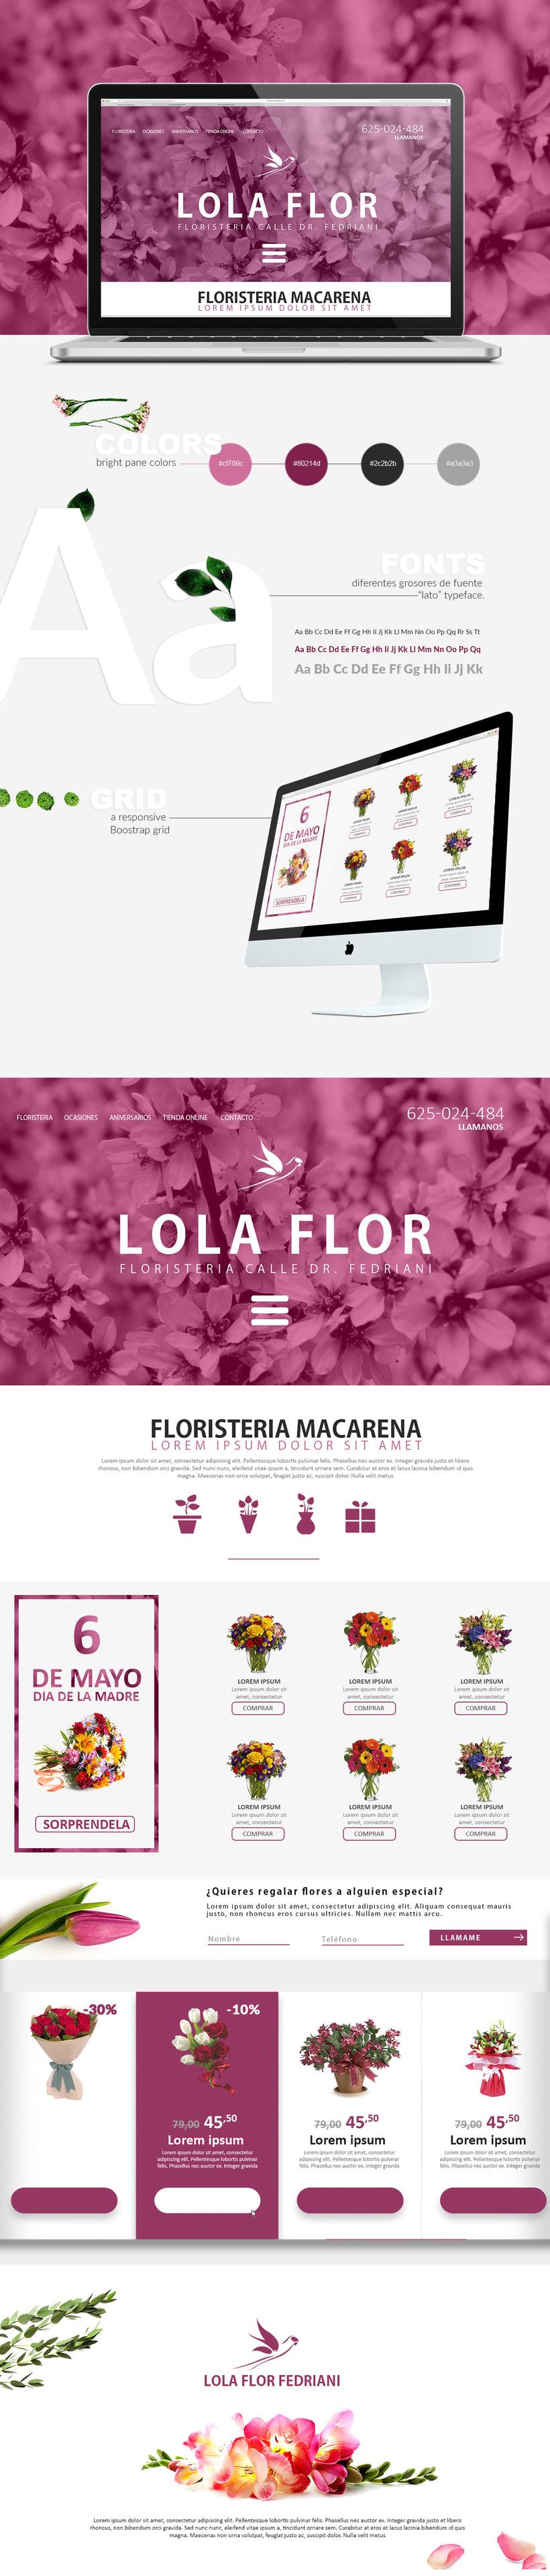 "Diseño web Lola Flor Fedriani ""Concept Home Page"" 0"